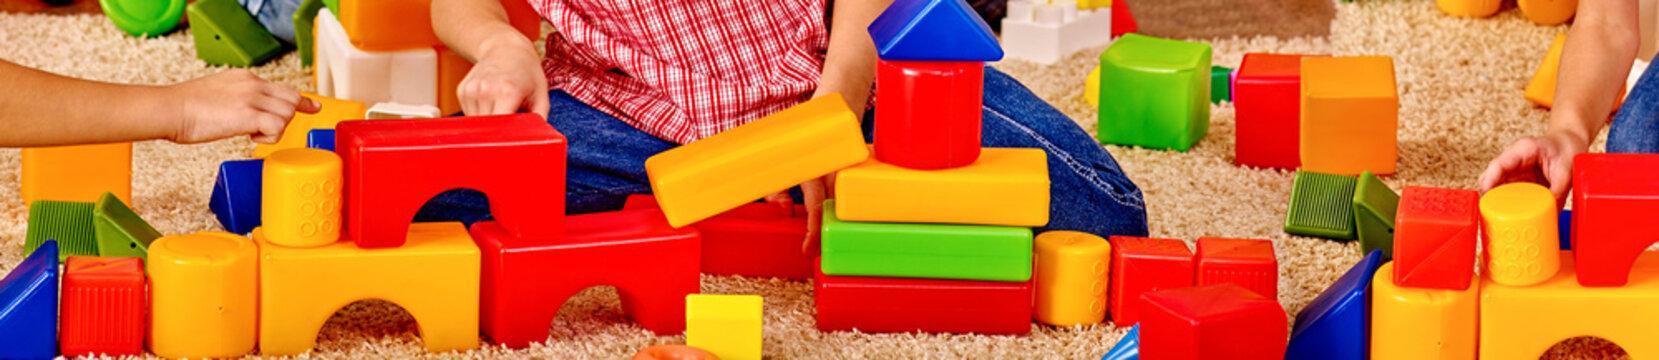 Baby cubes on horizontal long strip, banner design. Body part children hands playing in preschool.